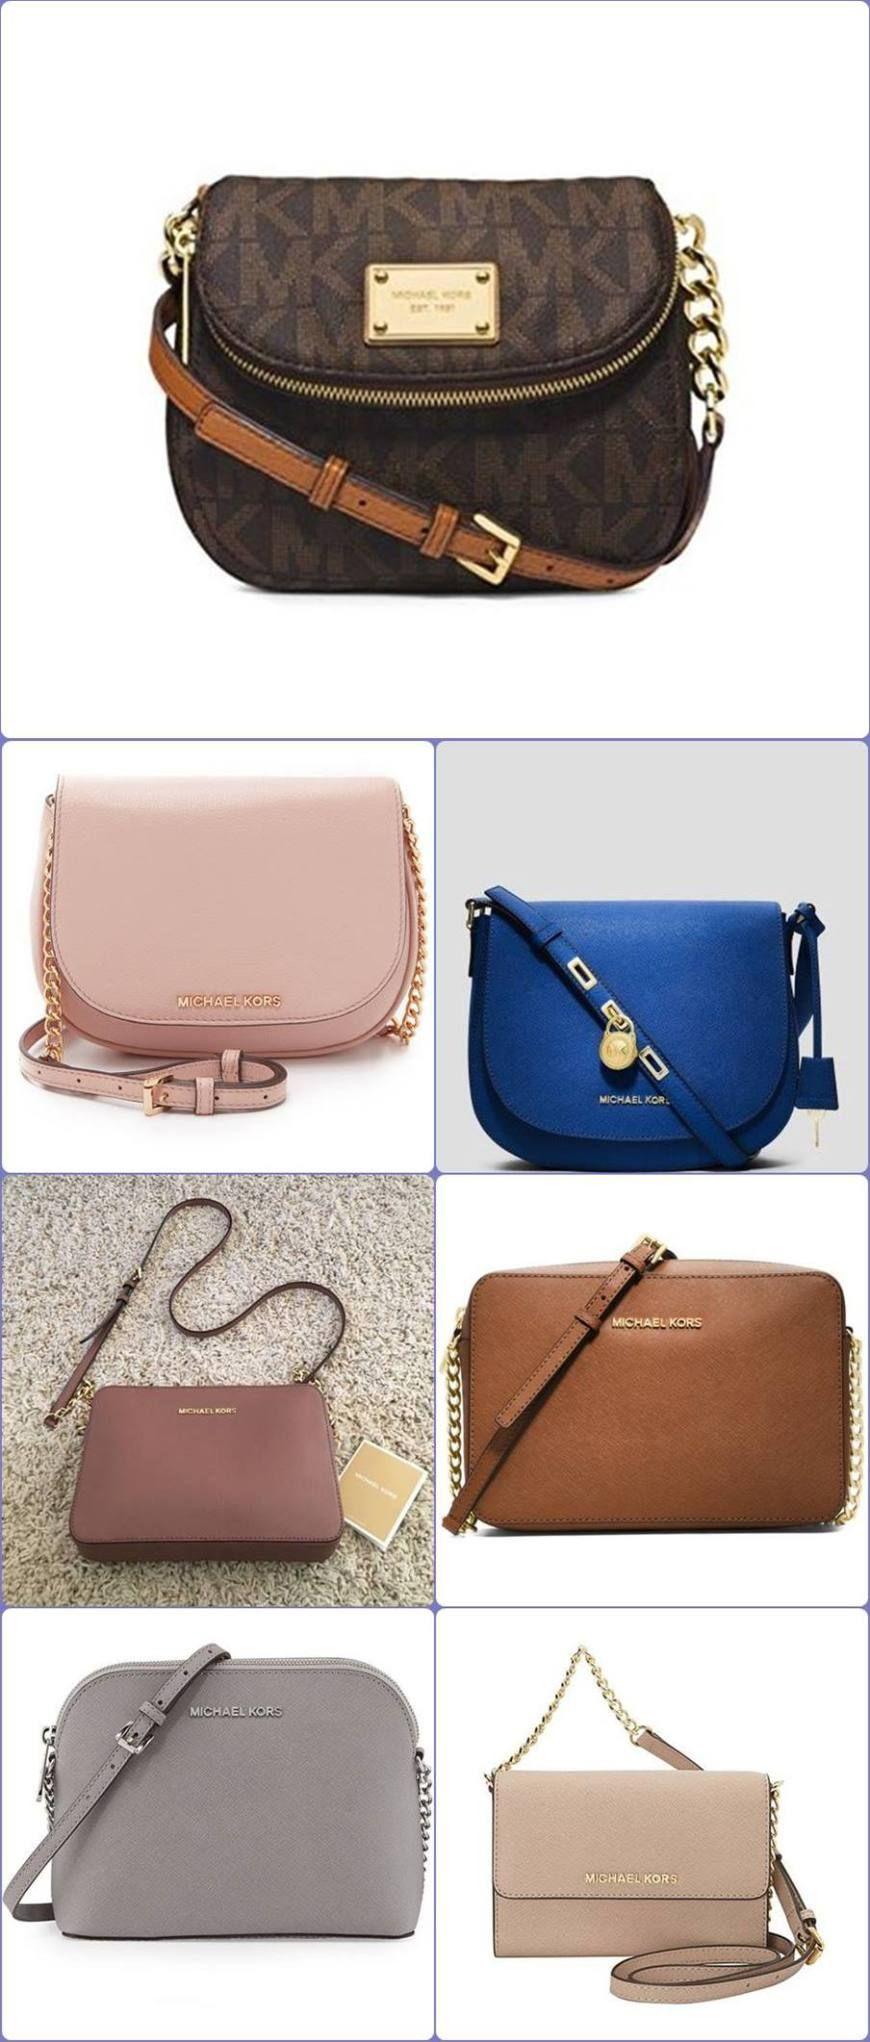 473024f12 Michael Kors bolsa pequena tiracolo , mini bag, handbag Bolsas Luxo, Bolsas  De Grife